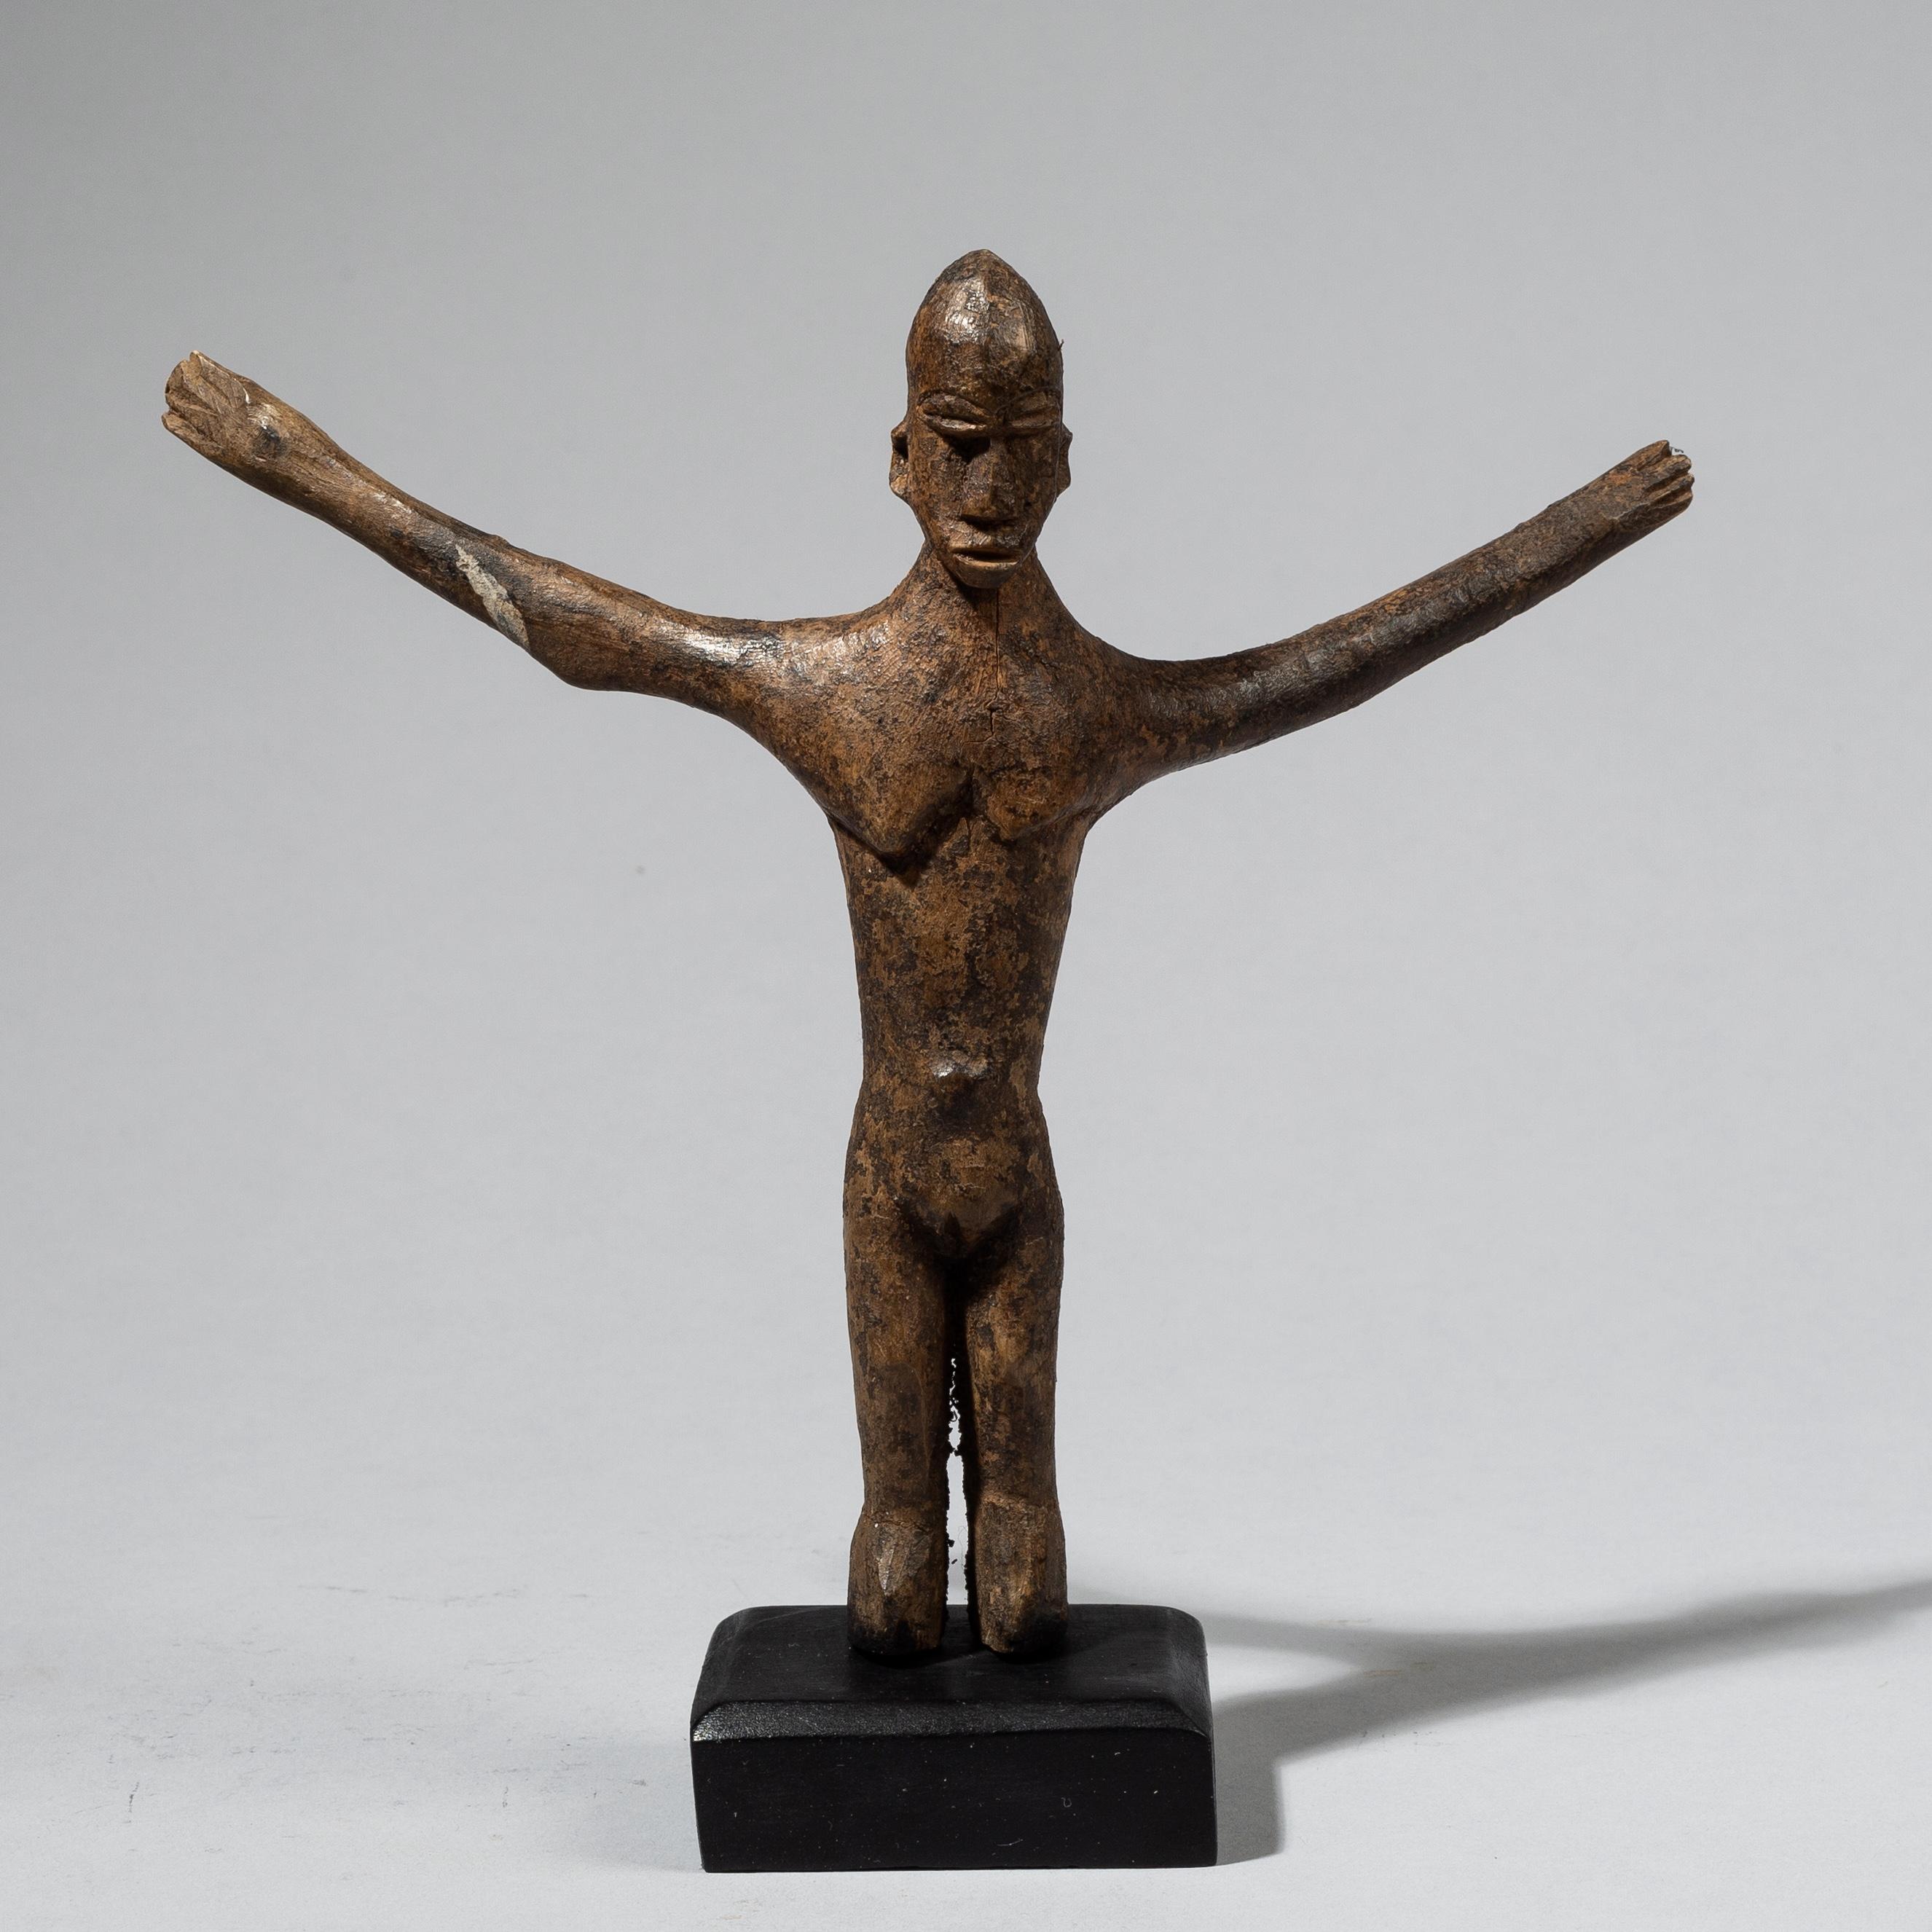 A SLENDER LOBI THIL FIGURE WITH WING LIKE ARMS, IVORY COAST ( No 4452)